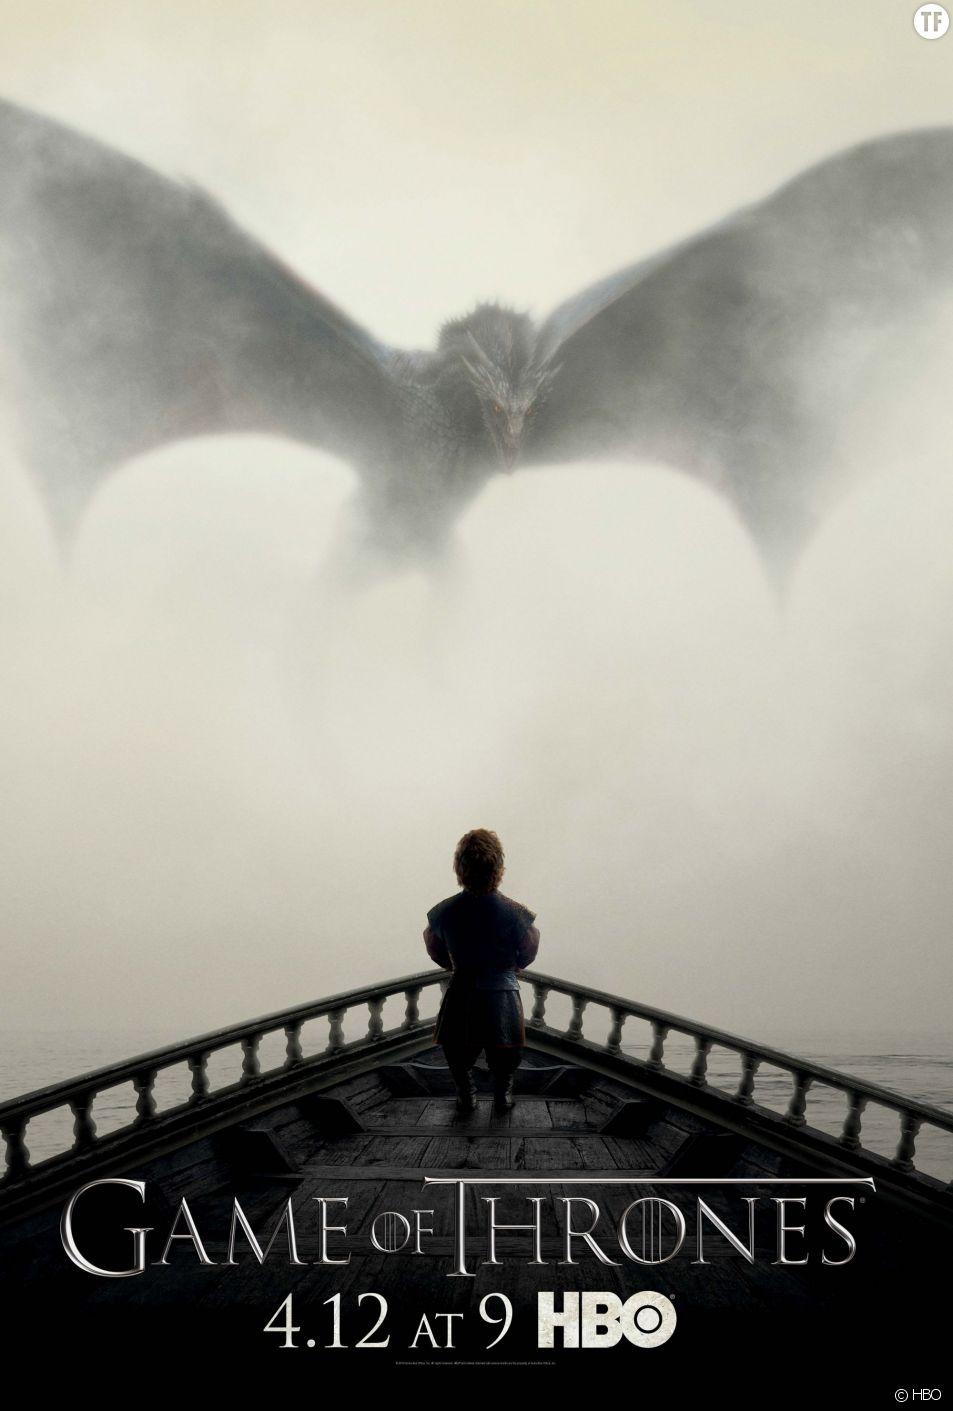 Game Of Thrones Saison 1 Streaming Vost : thrones, saison, streaming, Thrones, Saison, L'épisode, Streaming, Terrafemina